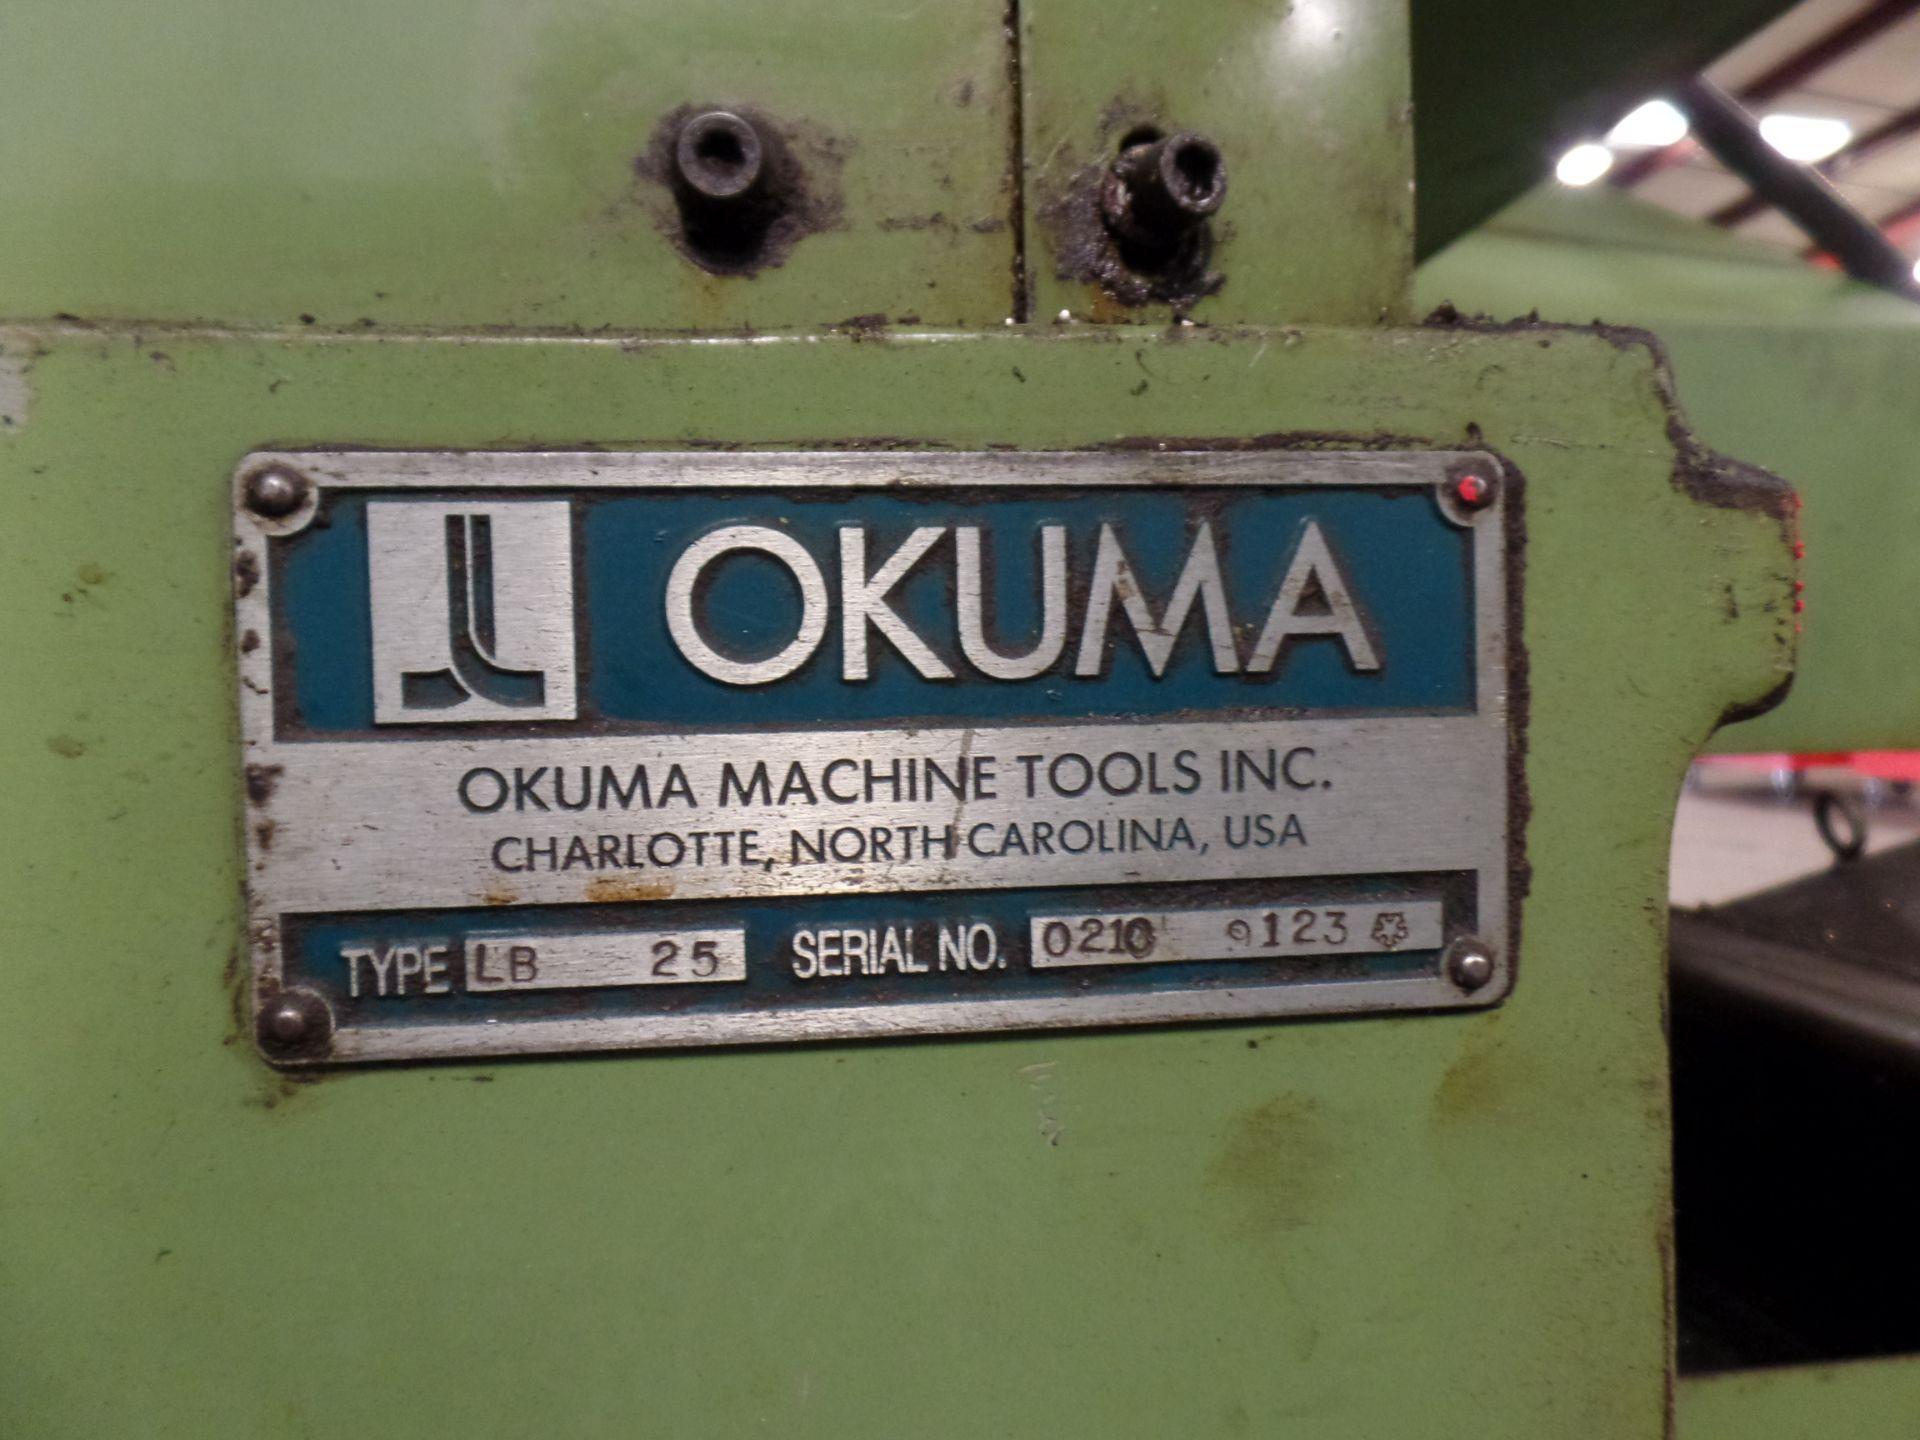 "1996 Okuma LB 25 2 Axis CNC Lathe, 5020 control , chip conveyor, 10"" chuck SN: 02109123 - Image 7 of 7"